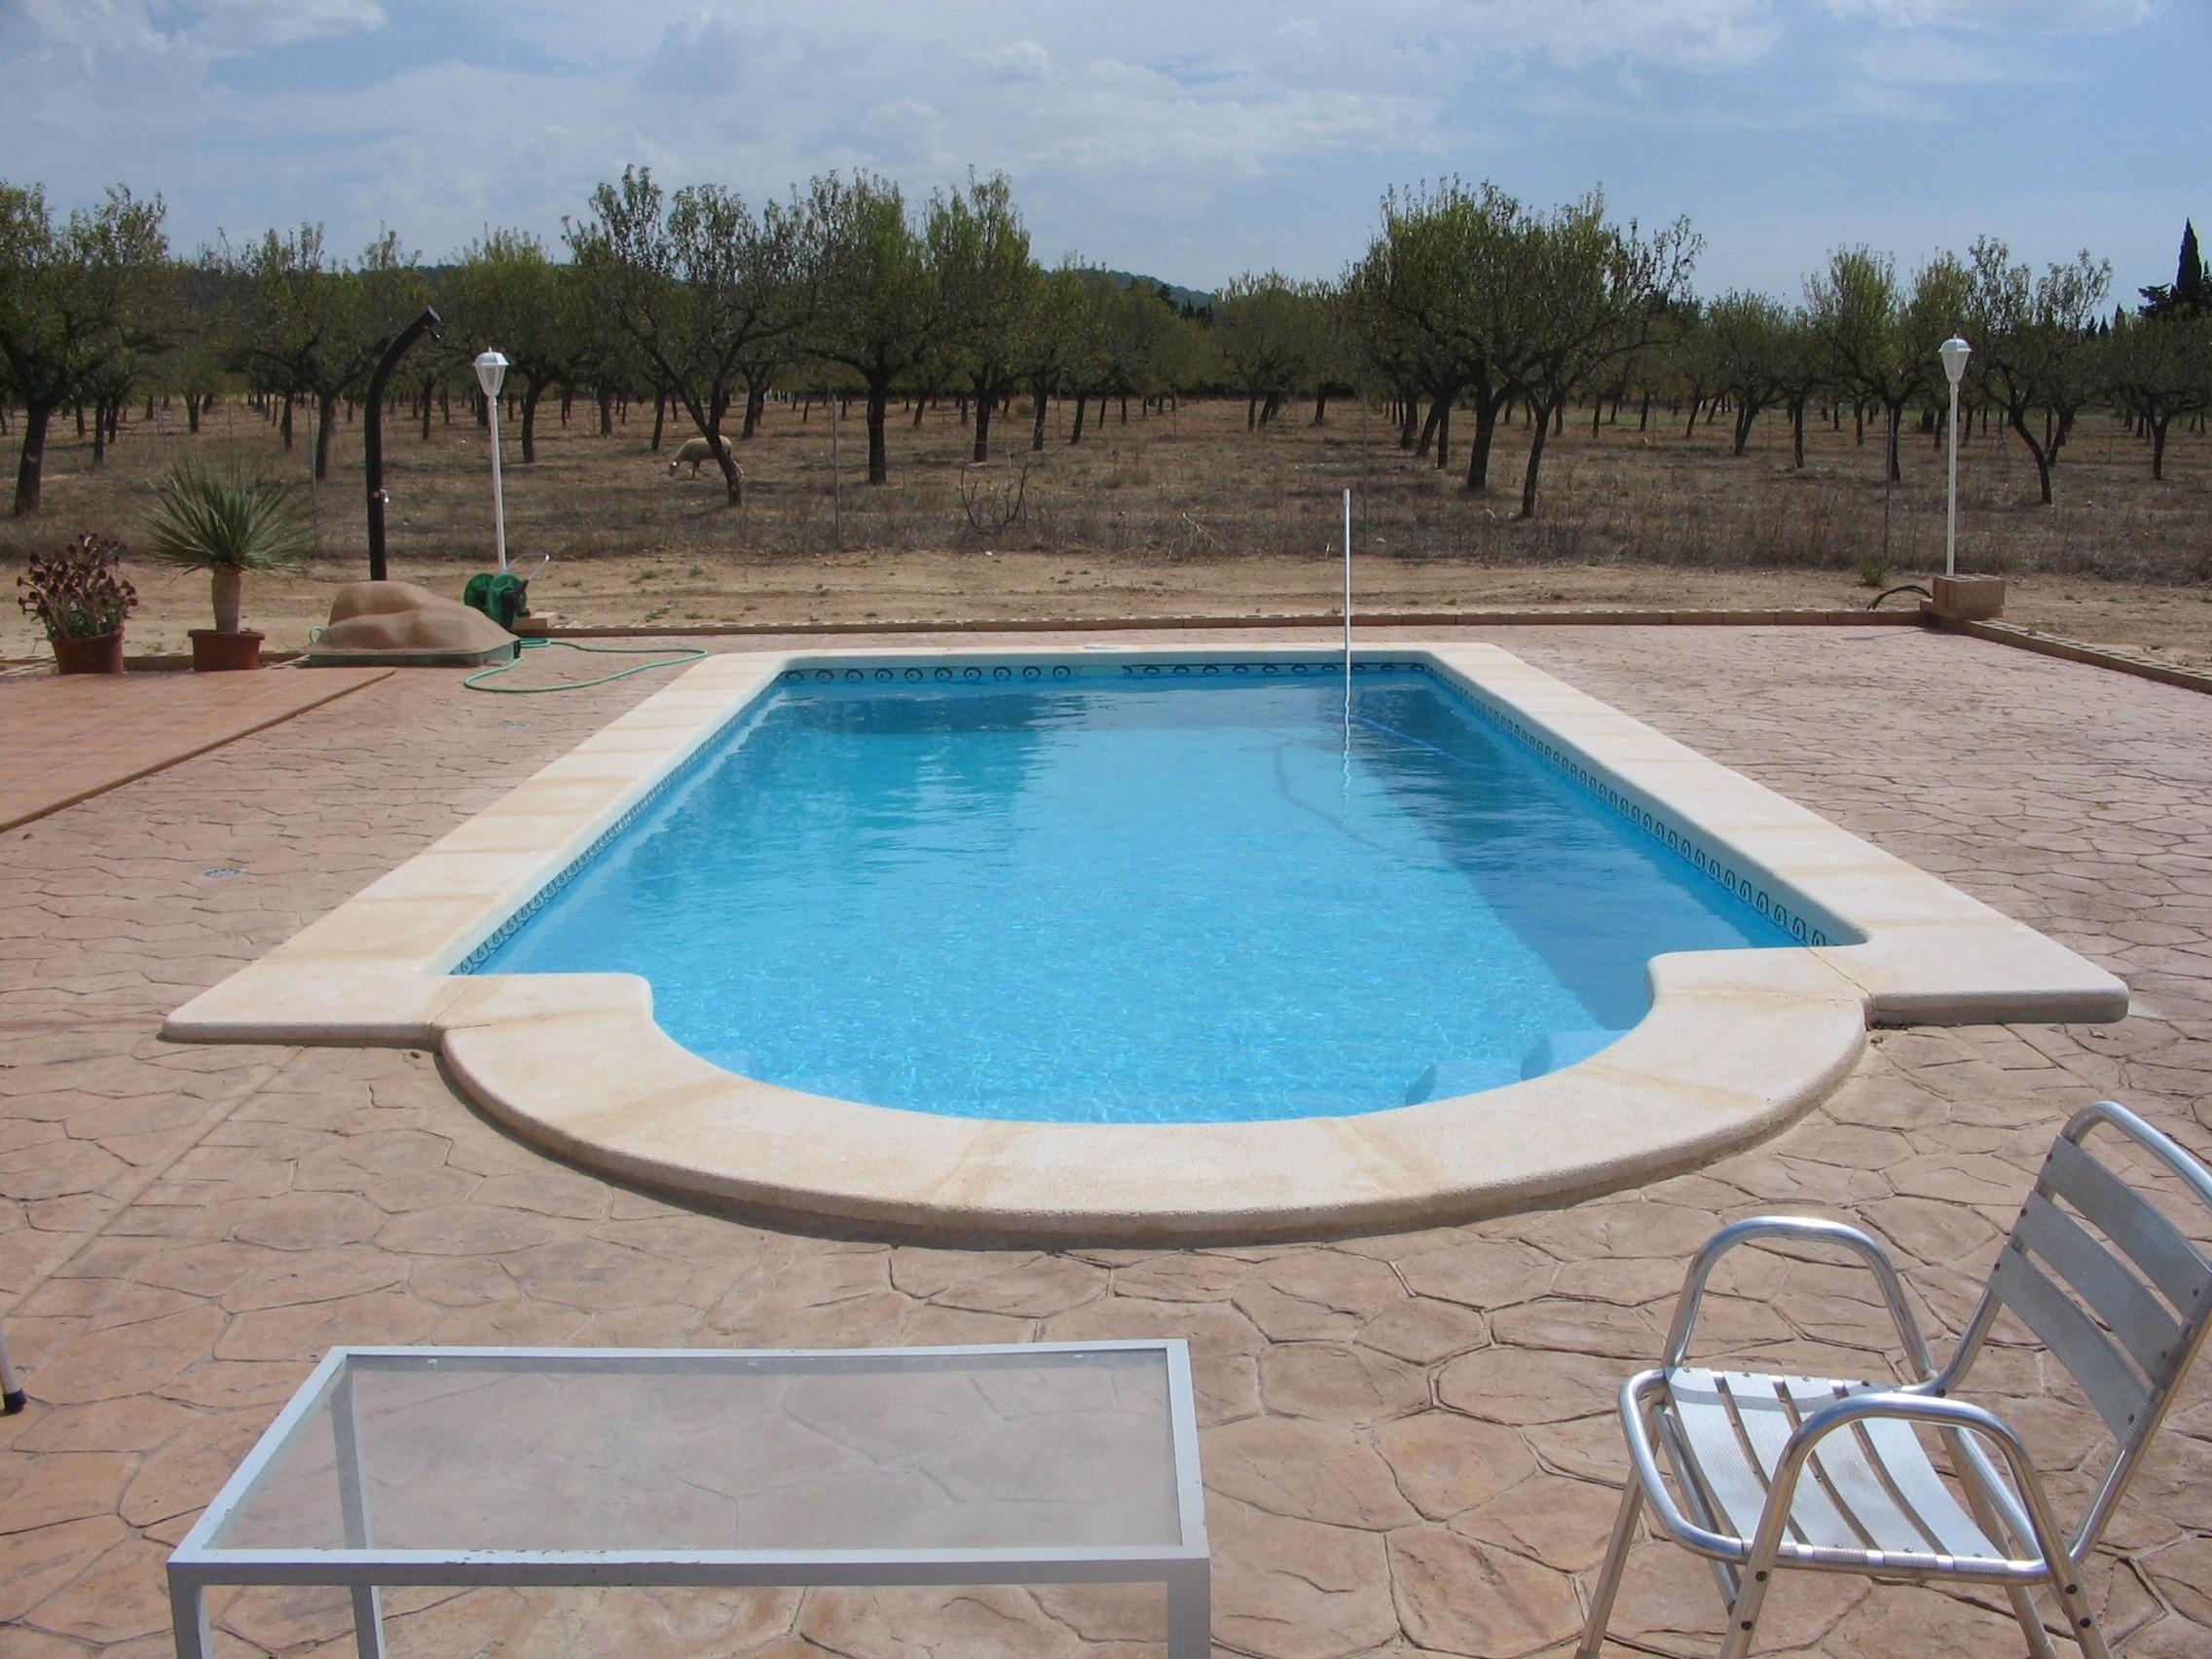 Piscina modelo c 9 codetrac s l expertos en piscinas - Piscinas de poliester precios ...